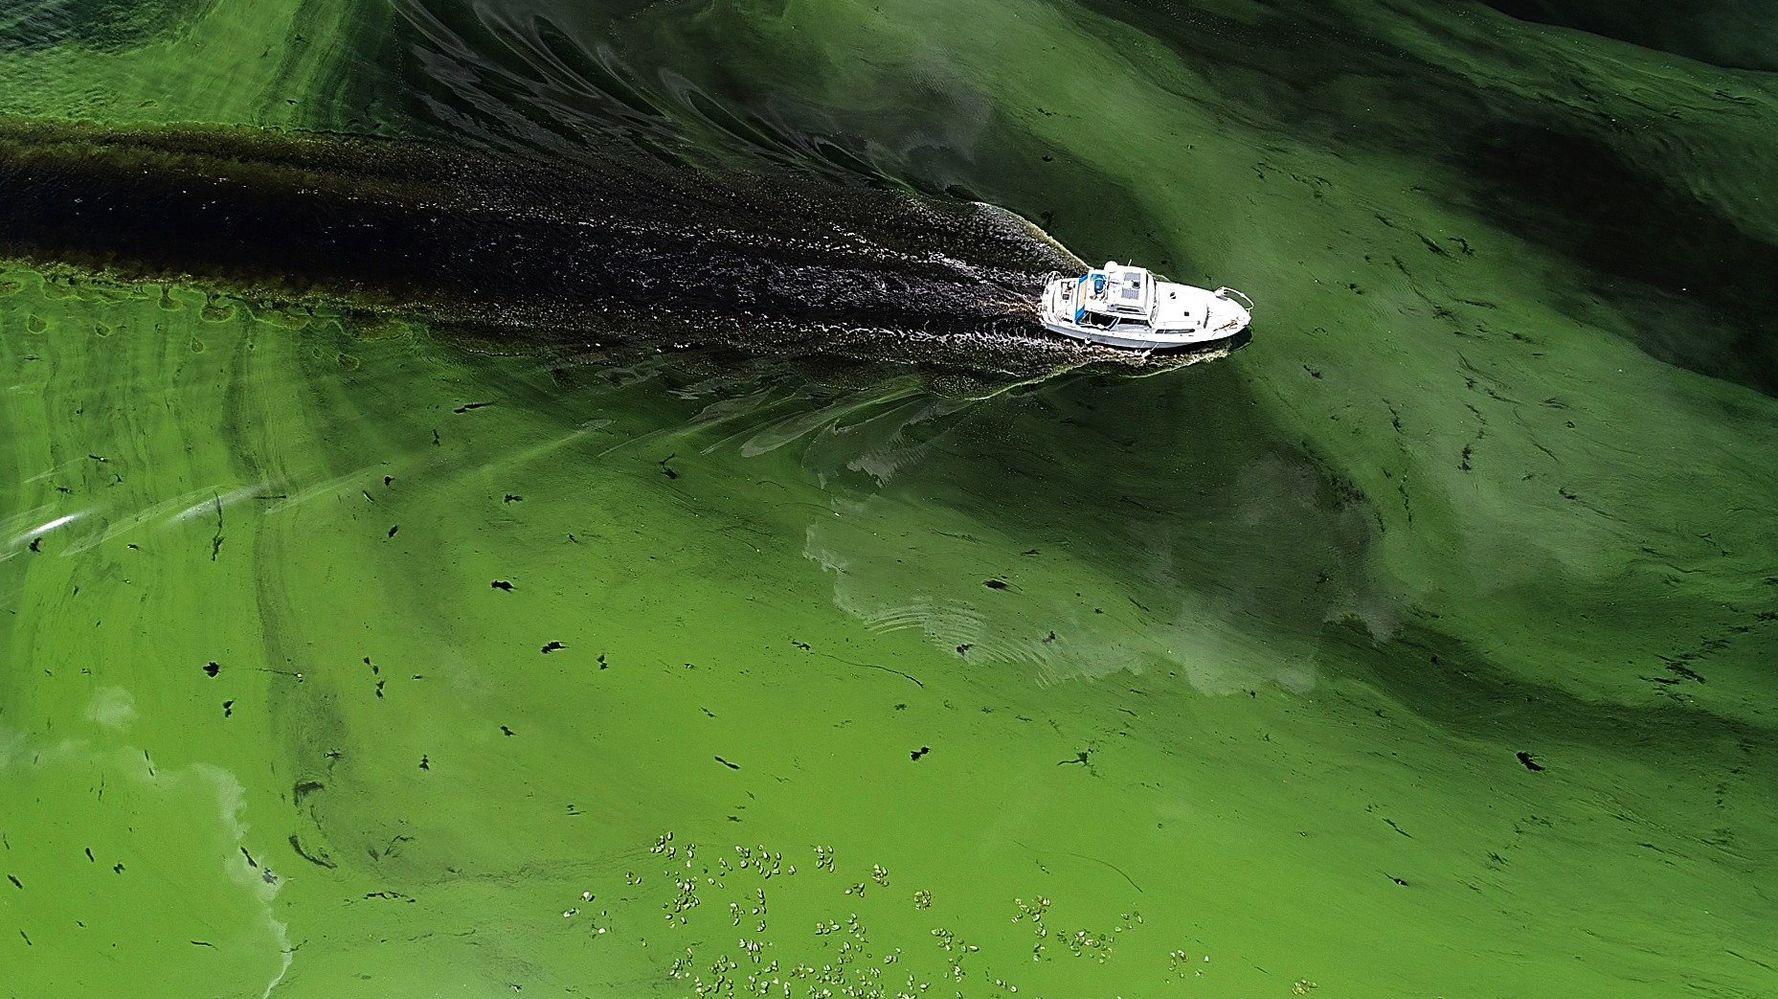 Record 'Red Tide' Of Toxic Algae Is Killing Wildlife In Florida